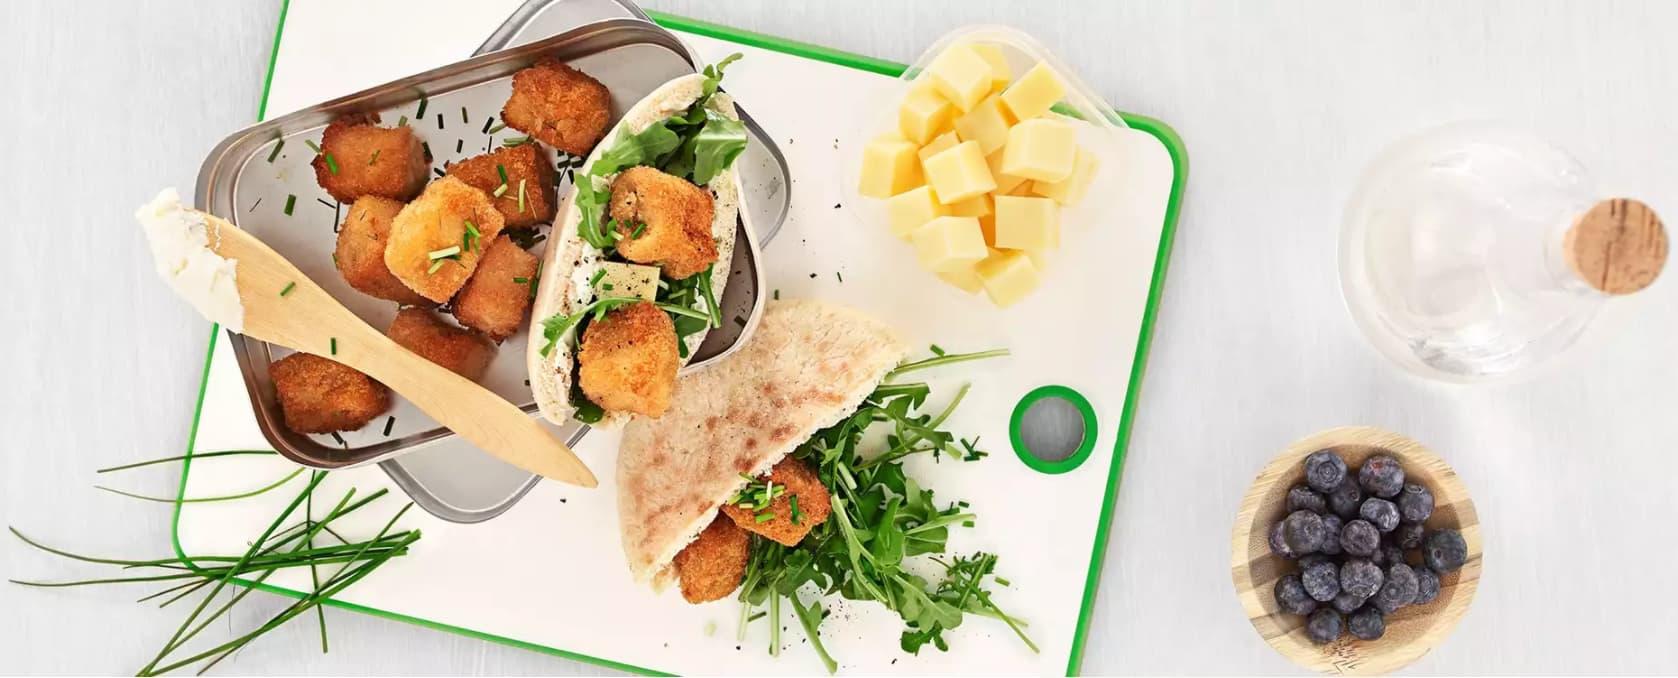 Hvem trenger grillpølser når man kan ha med seg en så god matpakke med pitabrød og torskenuggets i stedet?